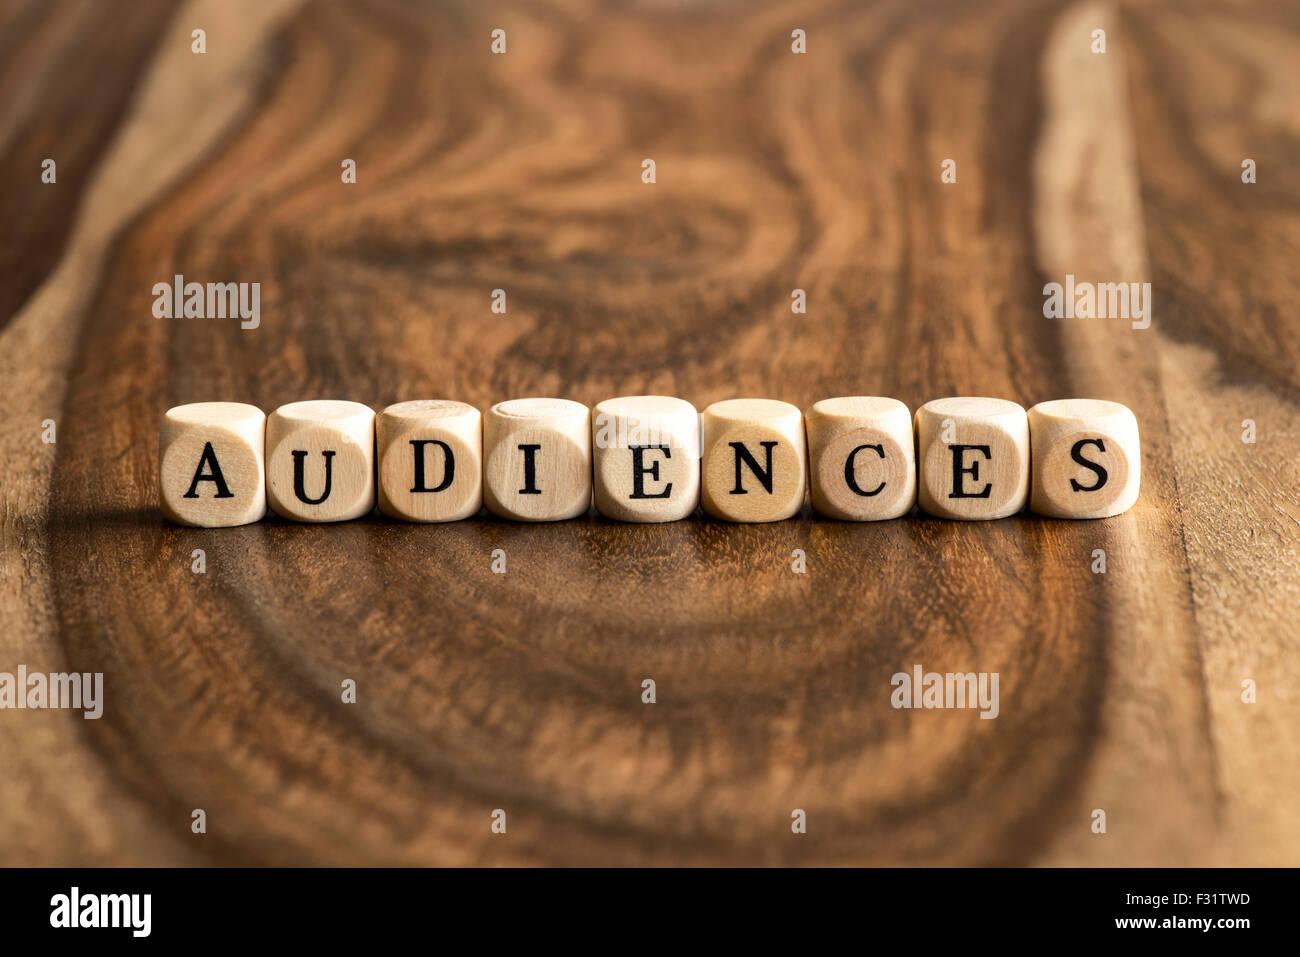 Publikum word Hintergrund auf Holzblöcke Stockbild